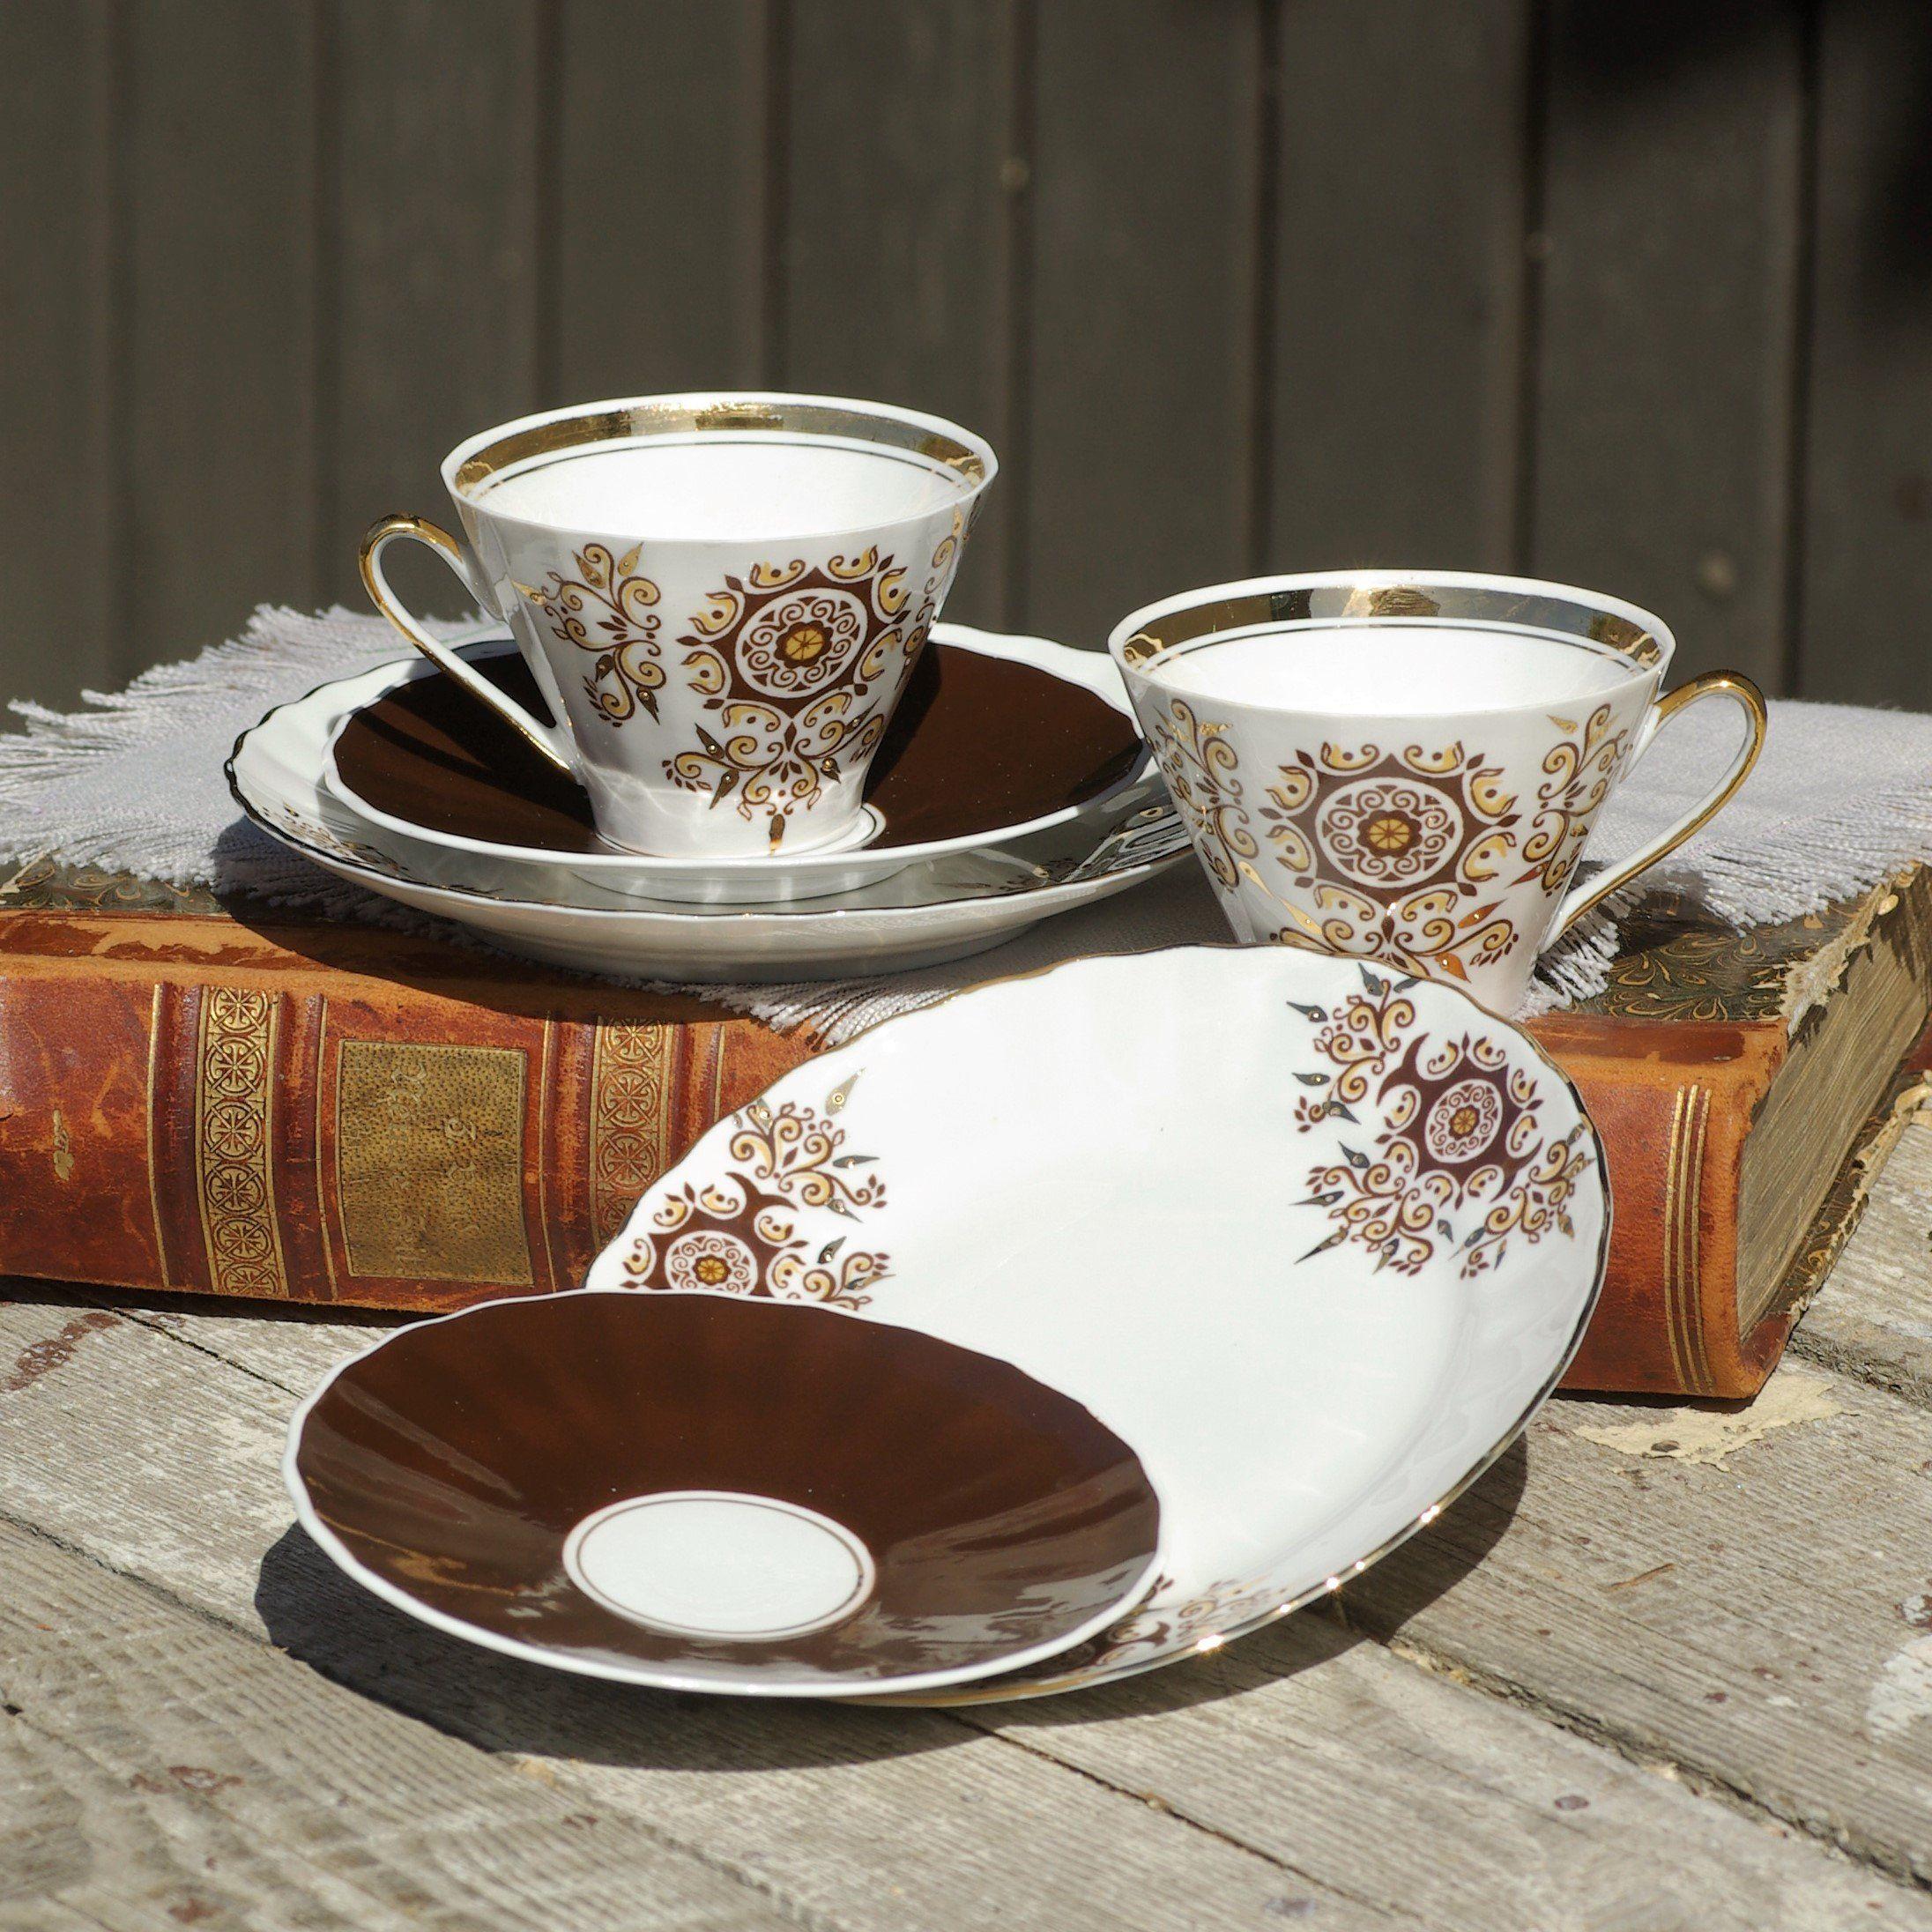 Coffee espresso set cups saucers cake plates bread